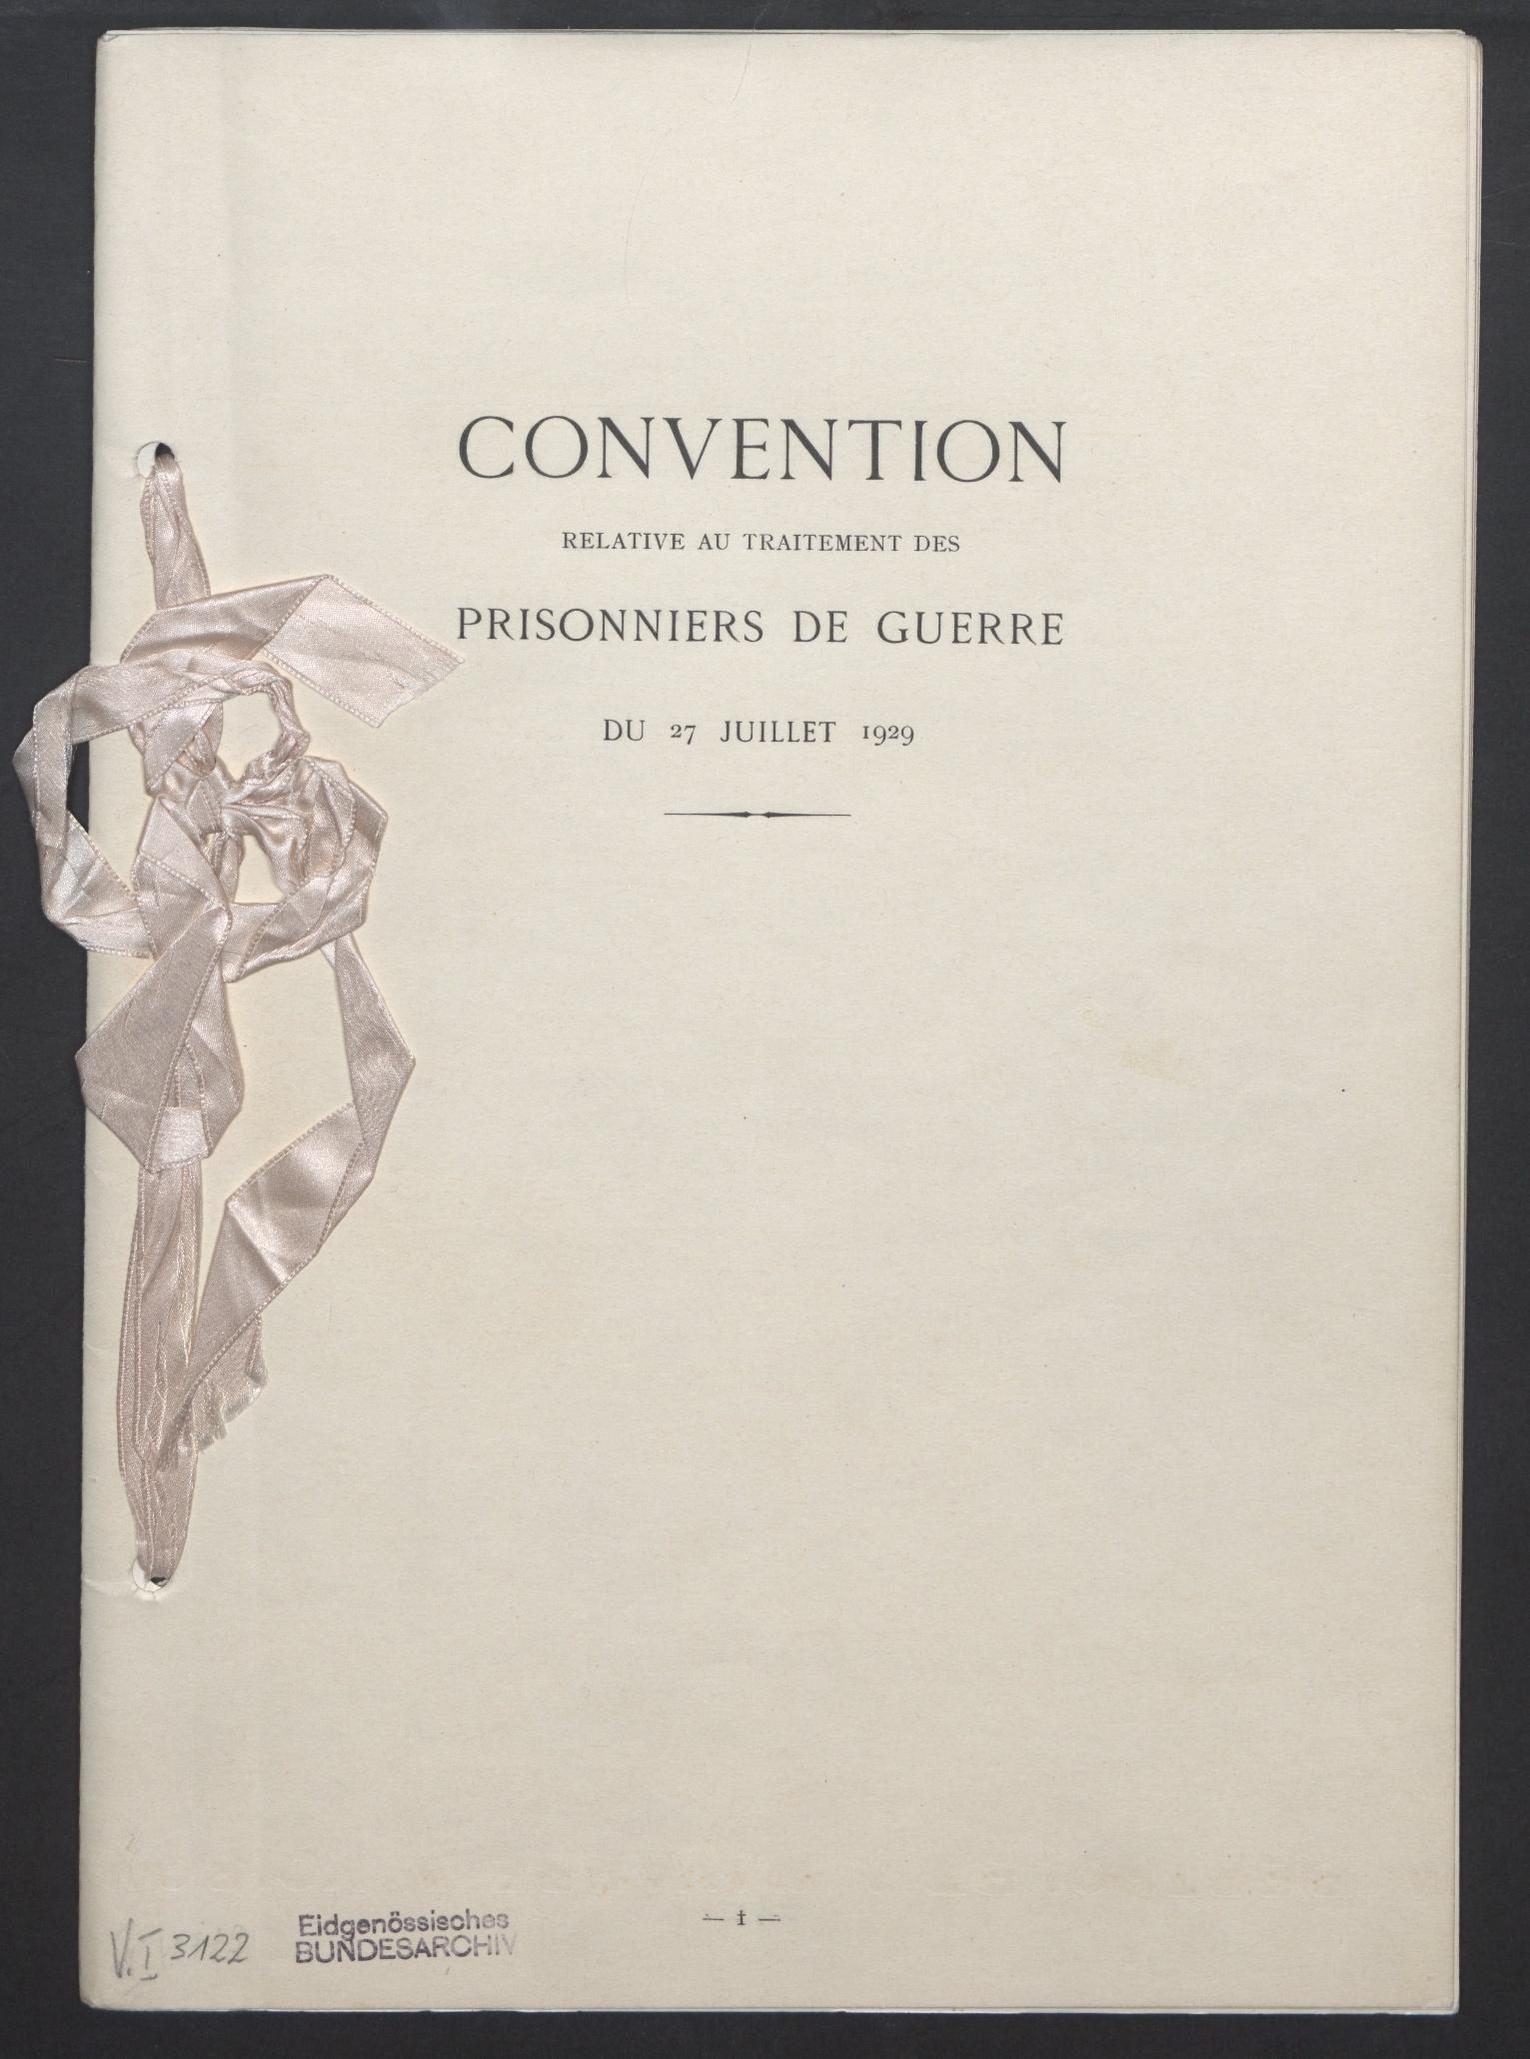 File:Geneva Convention of 1929-07-27 (prisoner of war) - CH-BAR - 29357032.pdf - Wikimedia Commons